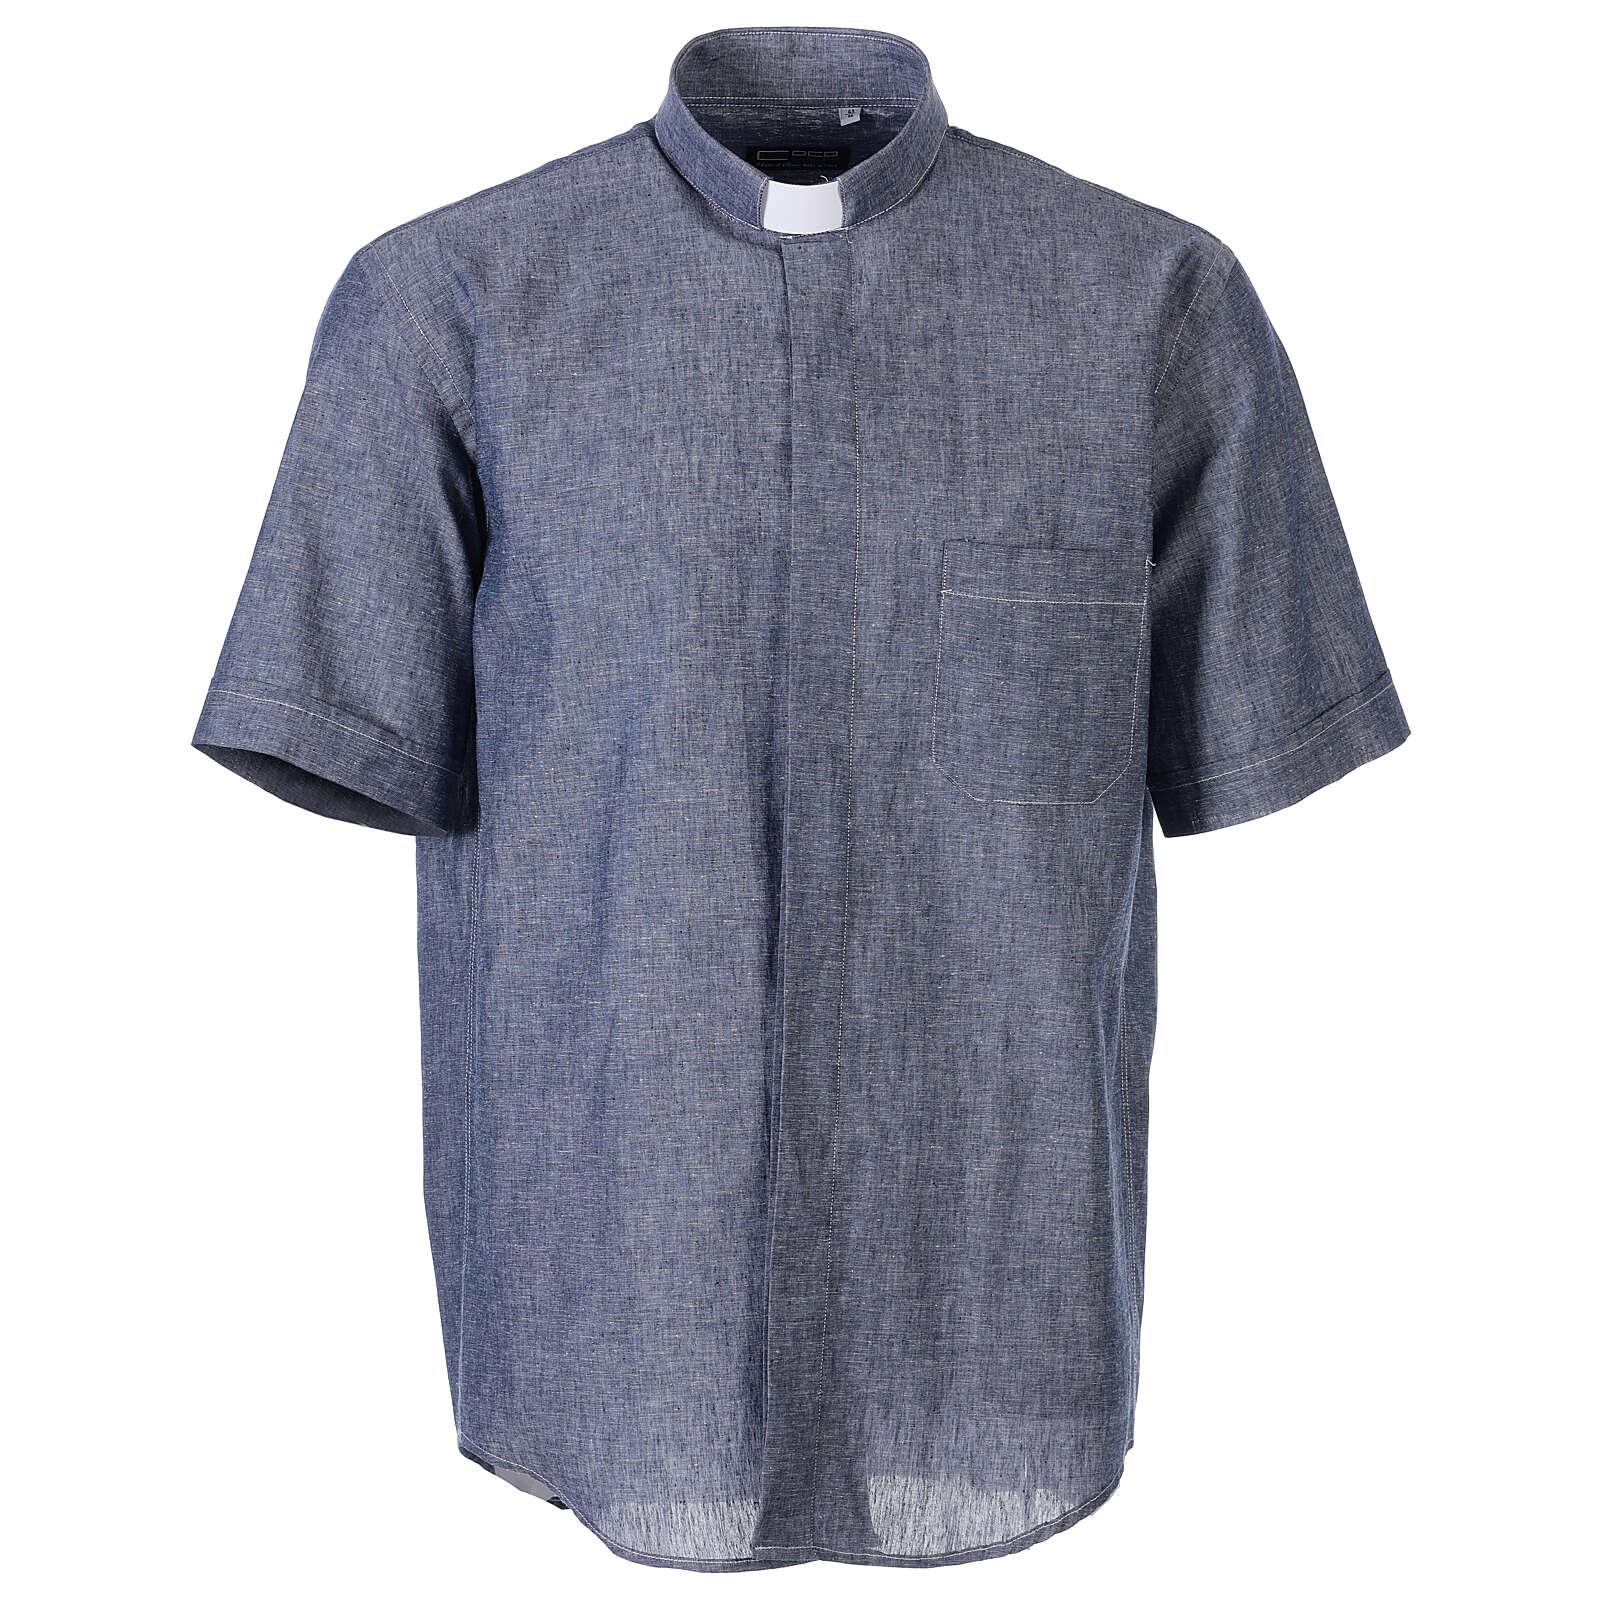 Camisa clergyman azul de hilo con manga corta 4